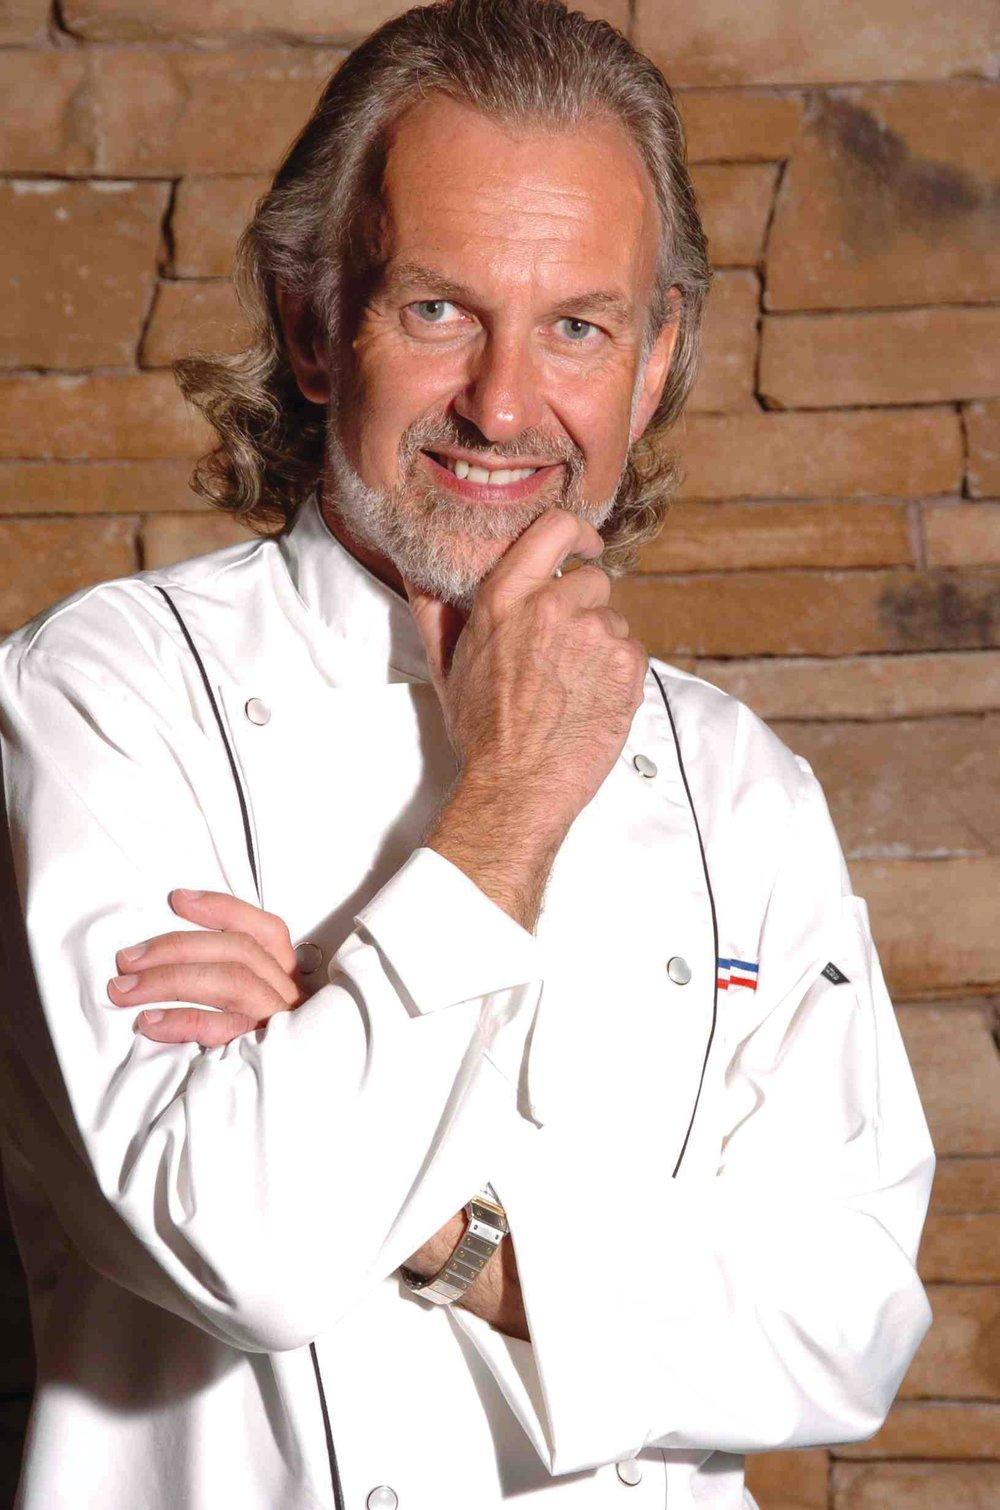 Chef Hubert Keller is now the executive chef of Fleur at Mandalay Bay, in Las Vegas.Photos Courtesy of Mandalay Bay